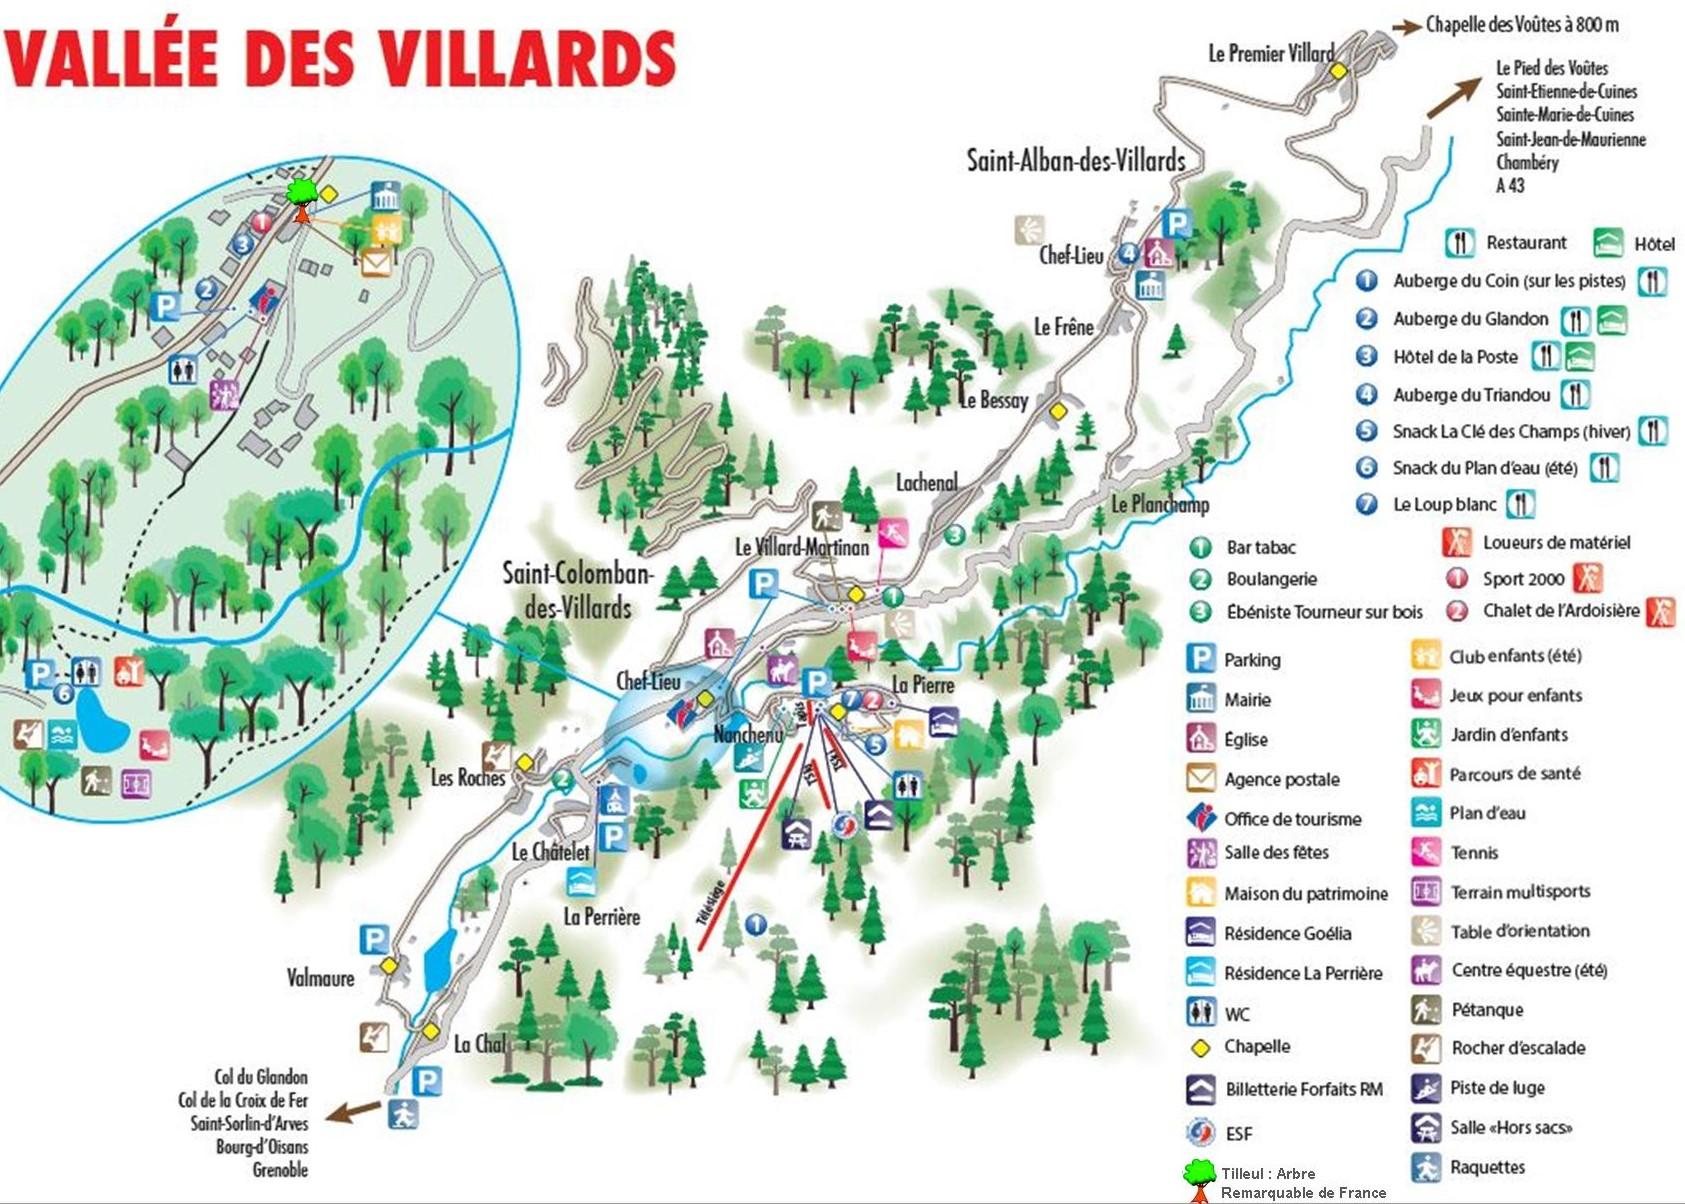 carte-touristique-vallee-des-villards-402